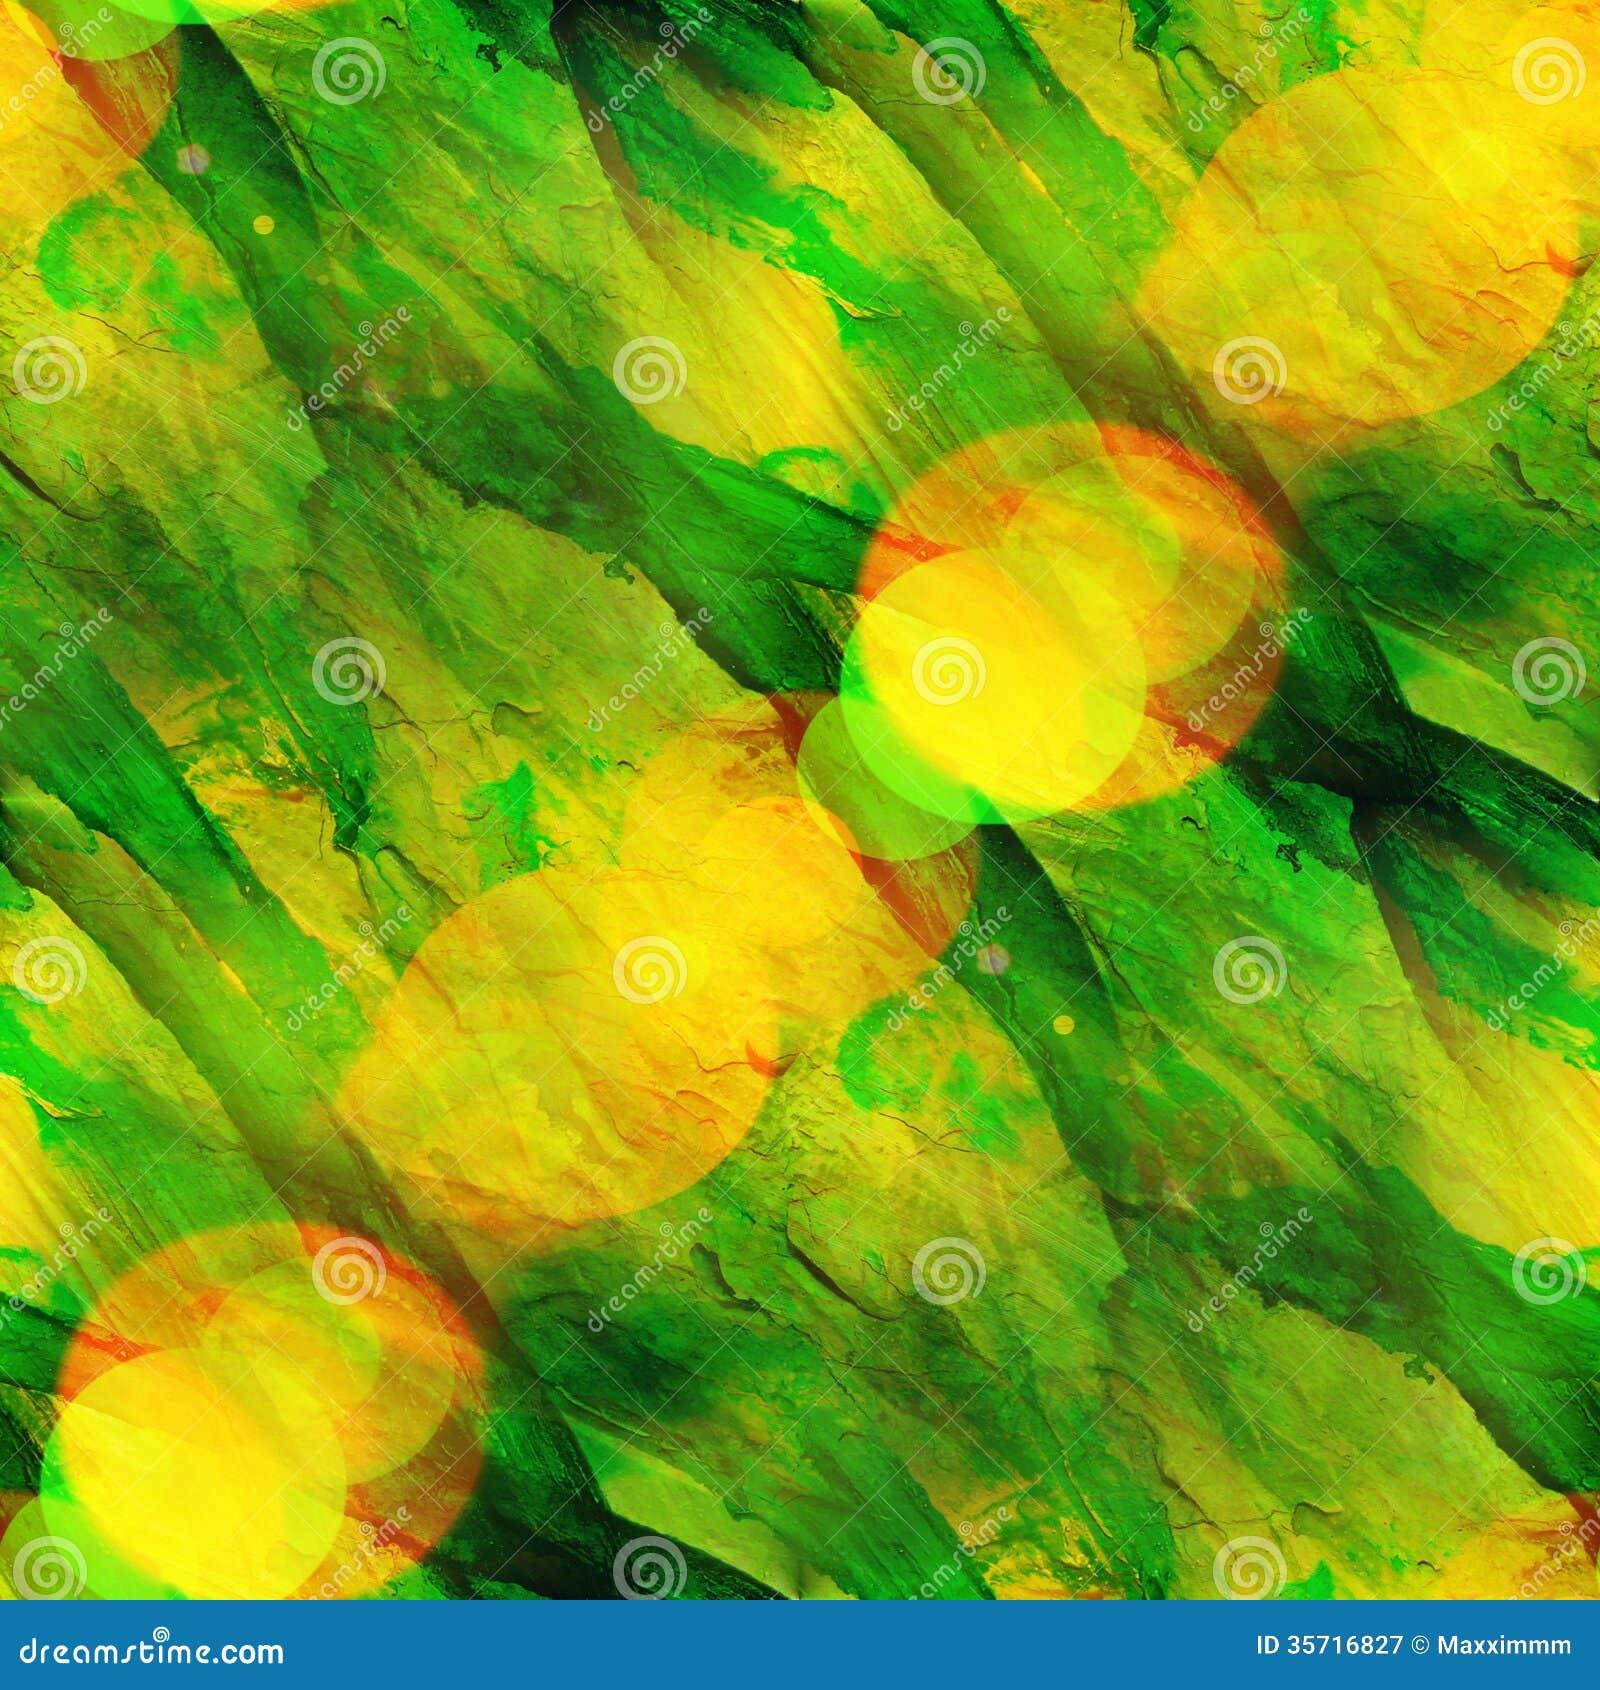 abstract yellow green drawing - photo #14